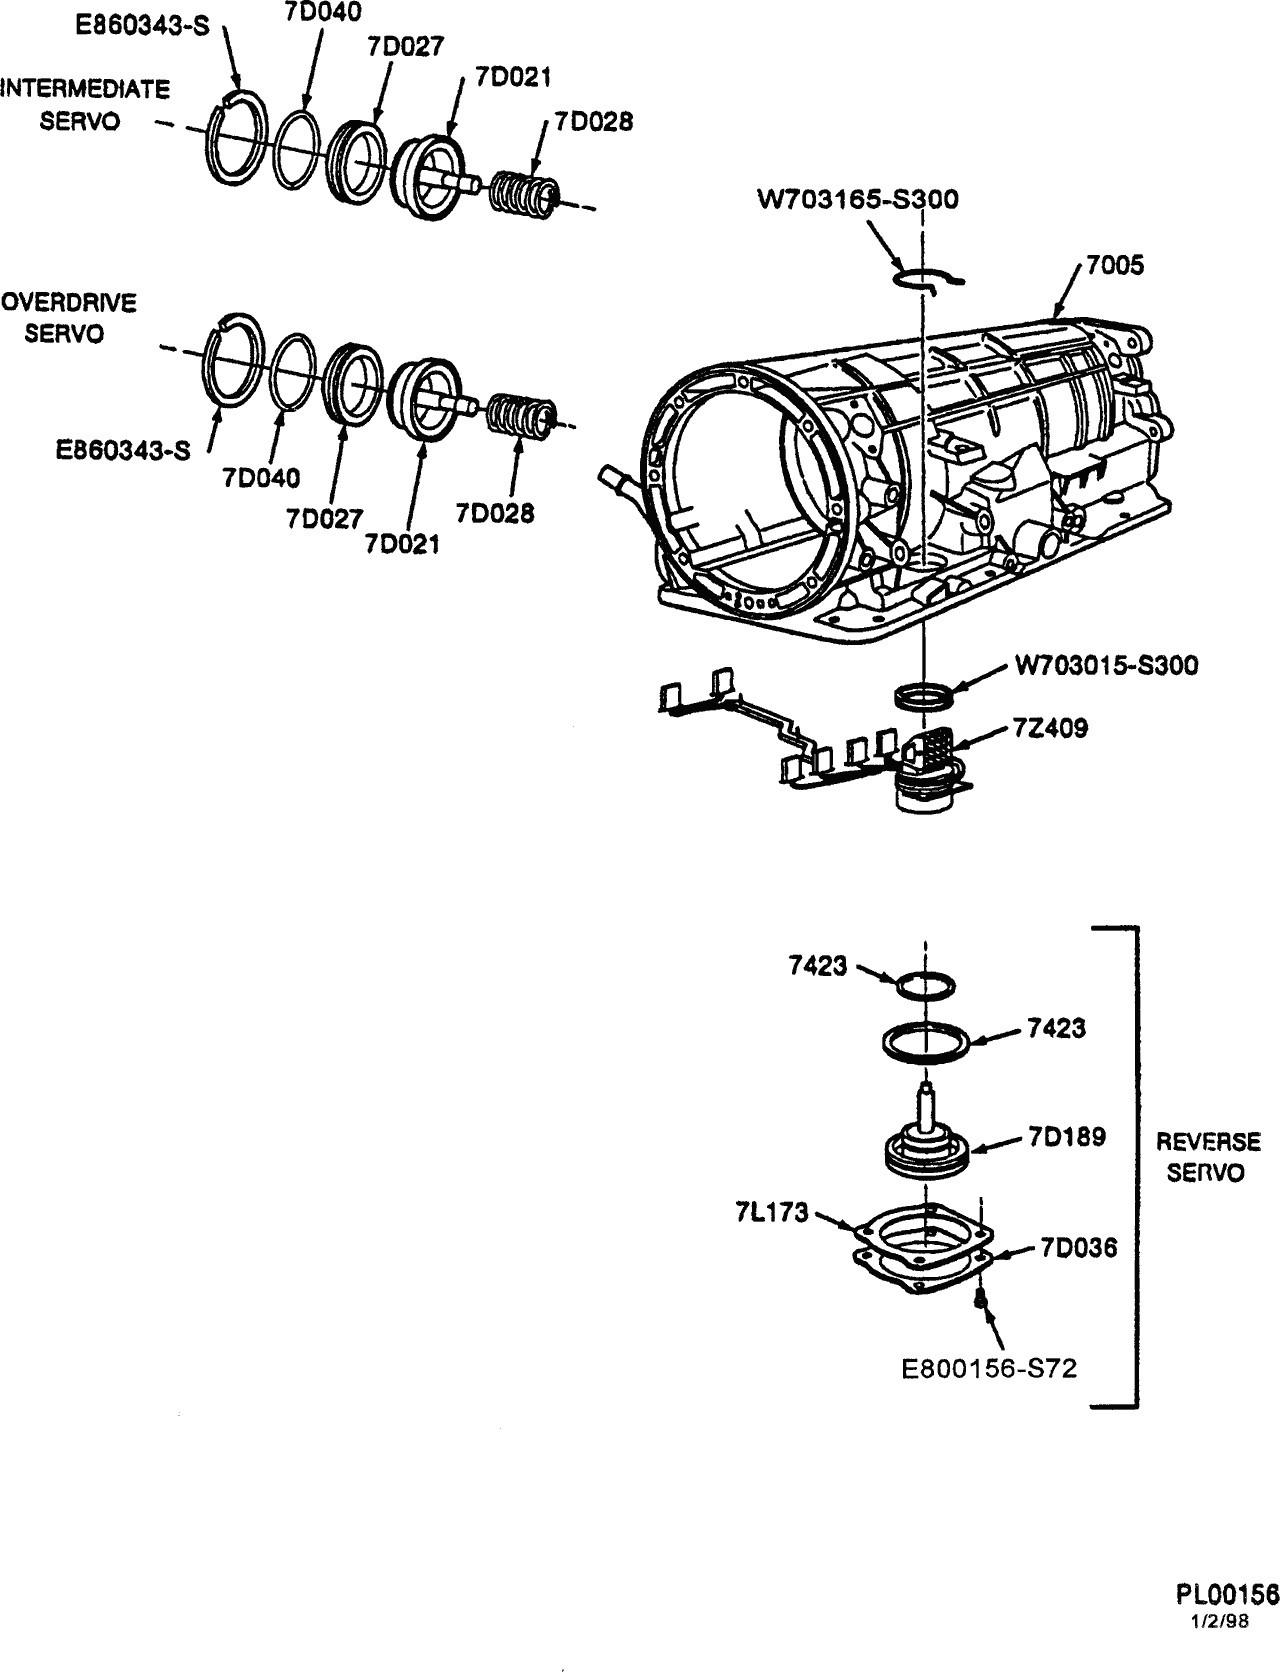 2002 ford Ranger Parts Diagram 4r70w Transmission Diagram